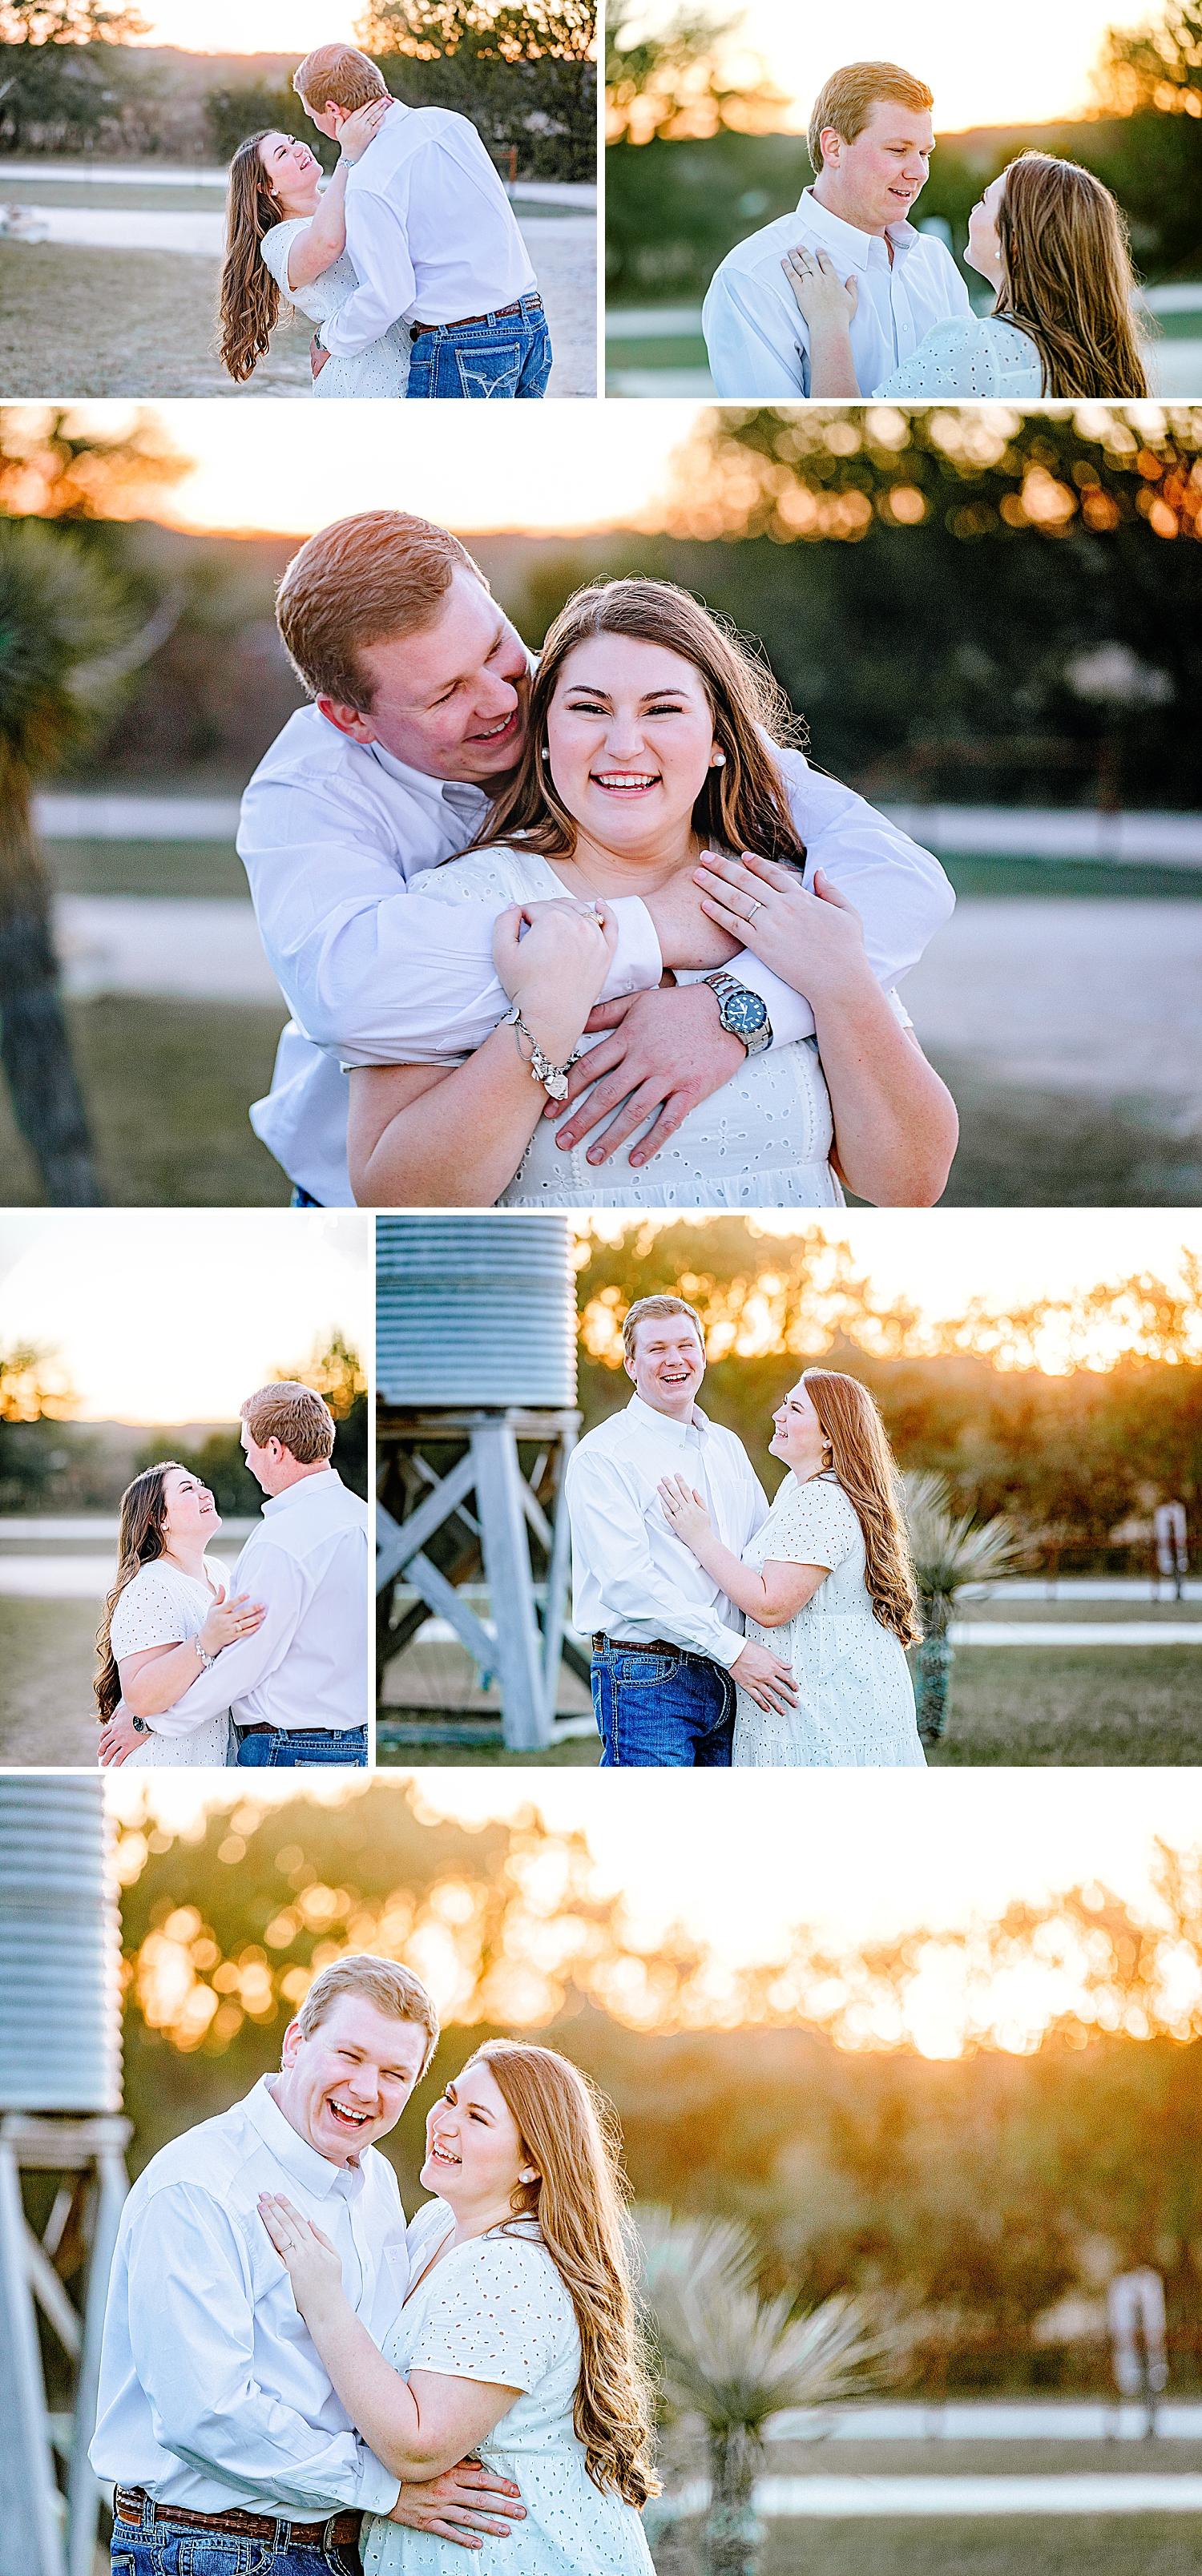 Engagement-photo-session-Western-Sky-wedding-venue-bulverde-texas-carly-barton-photography_0003.jpg